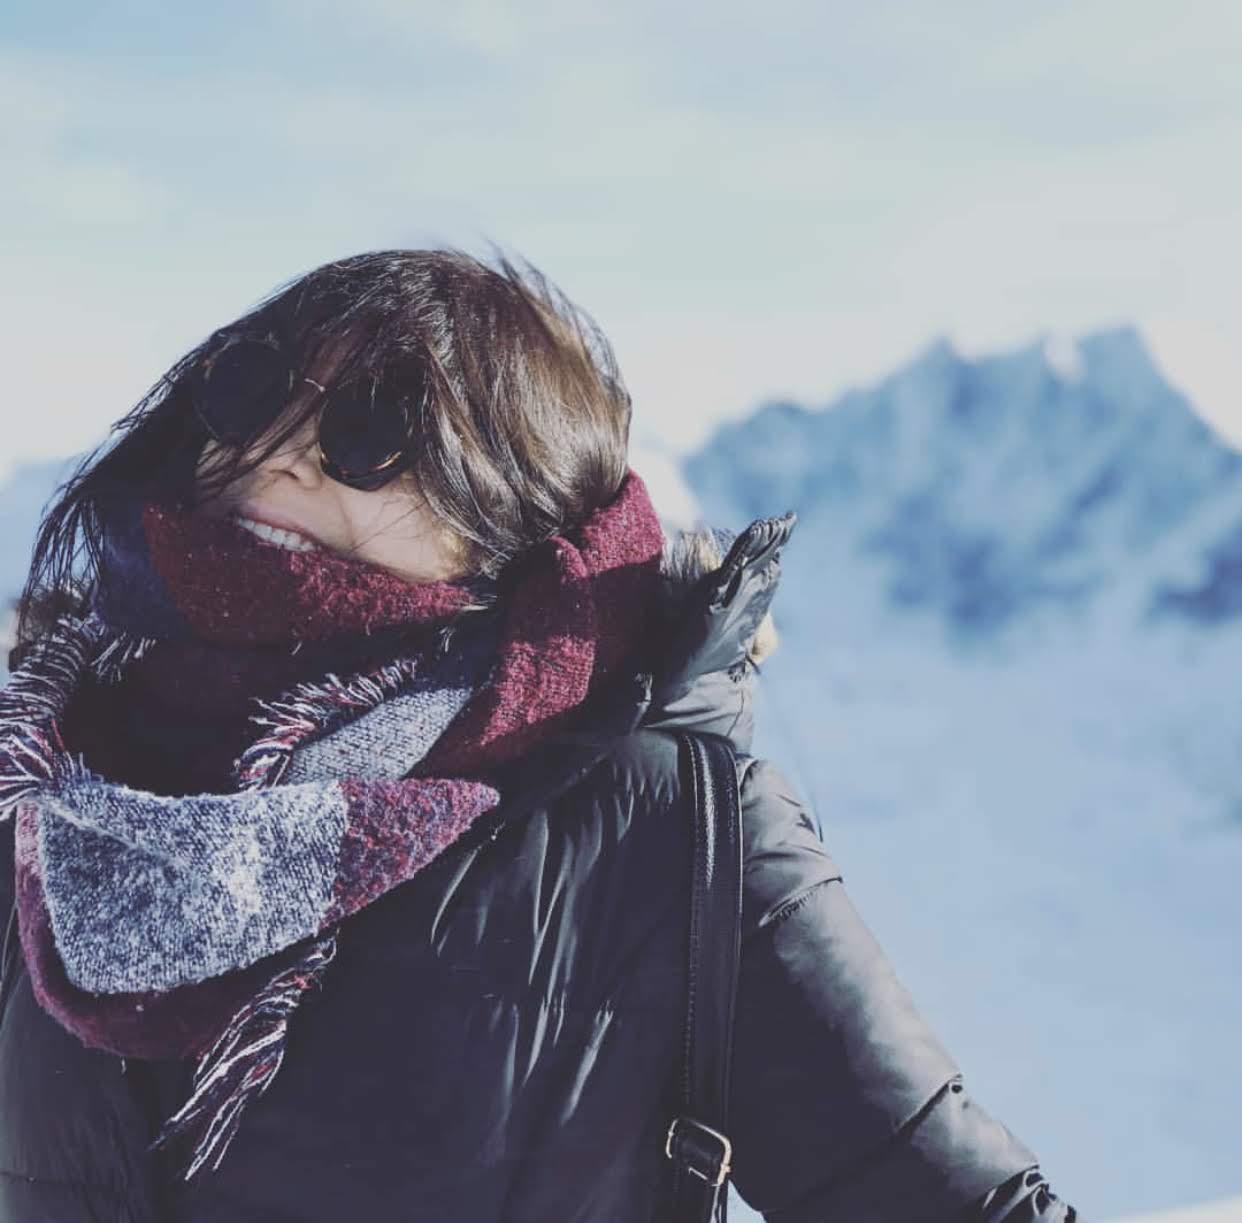 Dbaj o wzrok na nartach i śniegu [źródło: dbajowzrok]